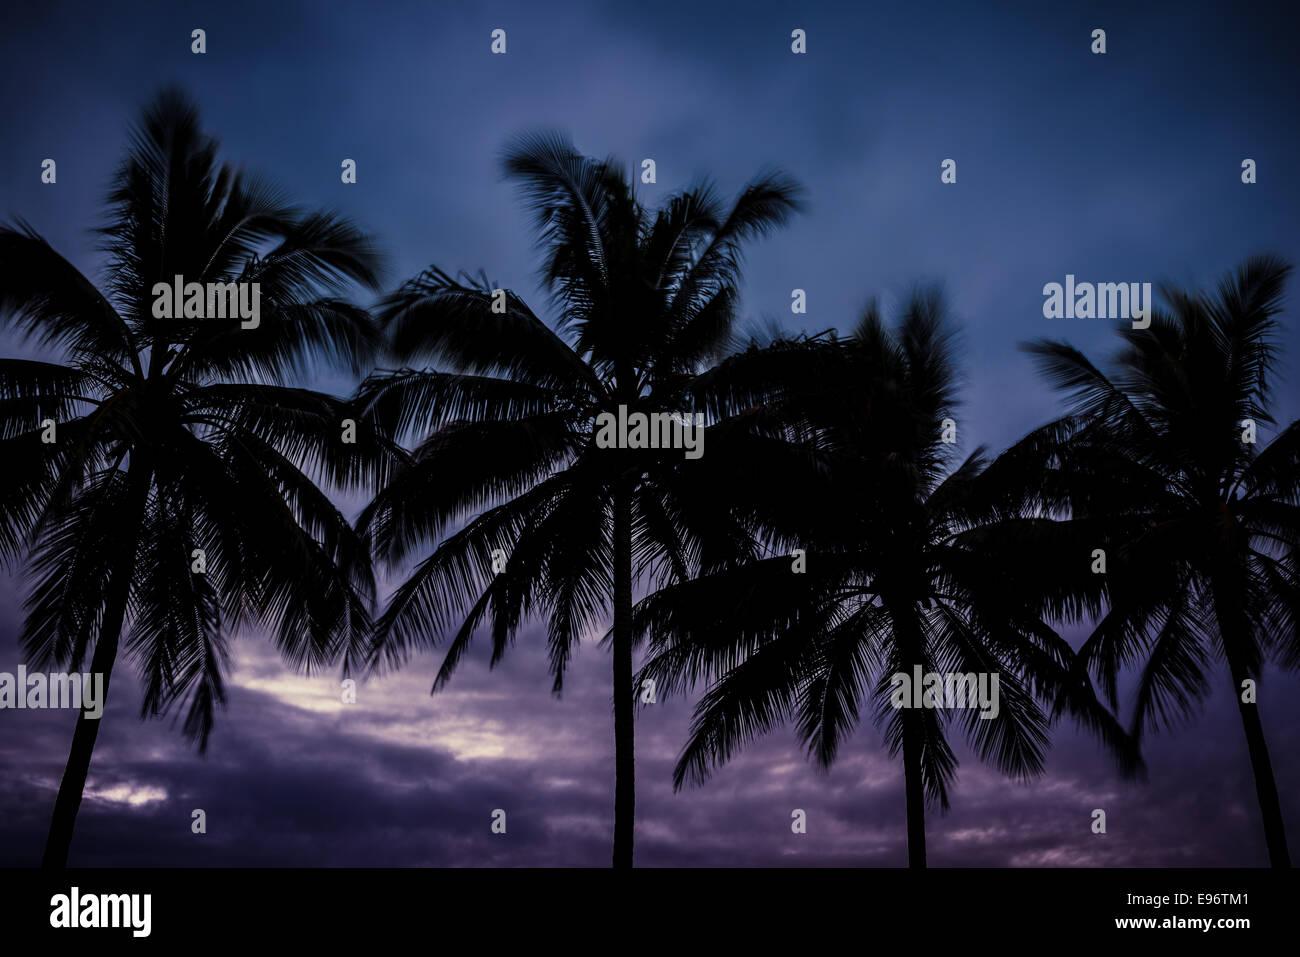 Palm trees at sunset at Port Douglas - Stock Image